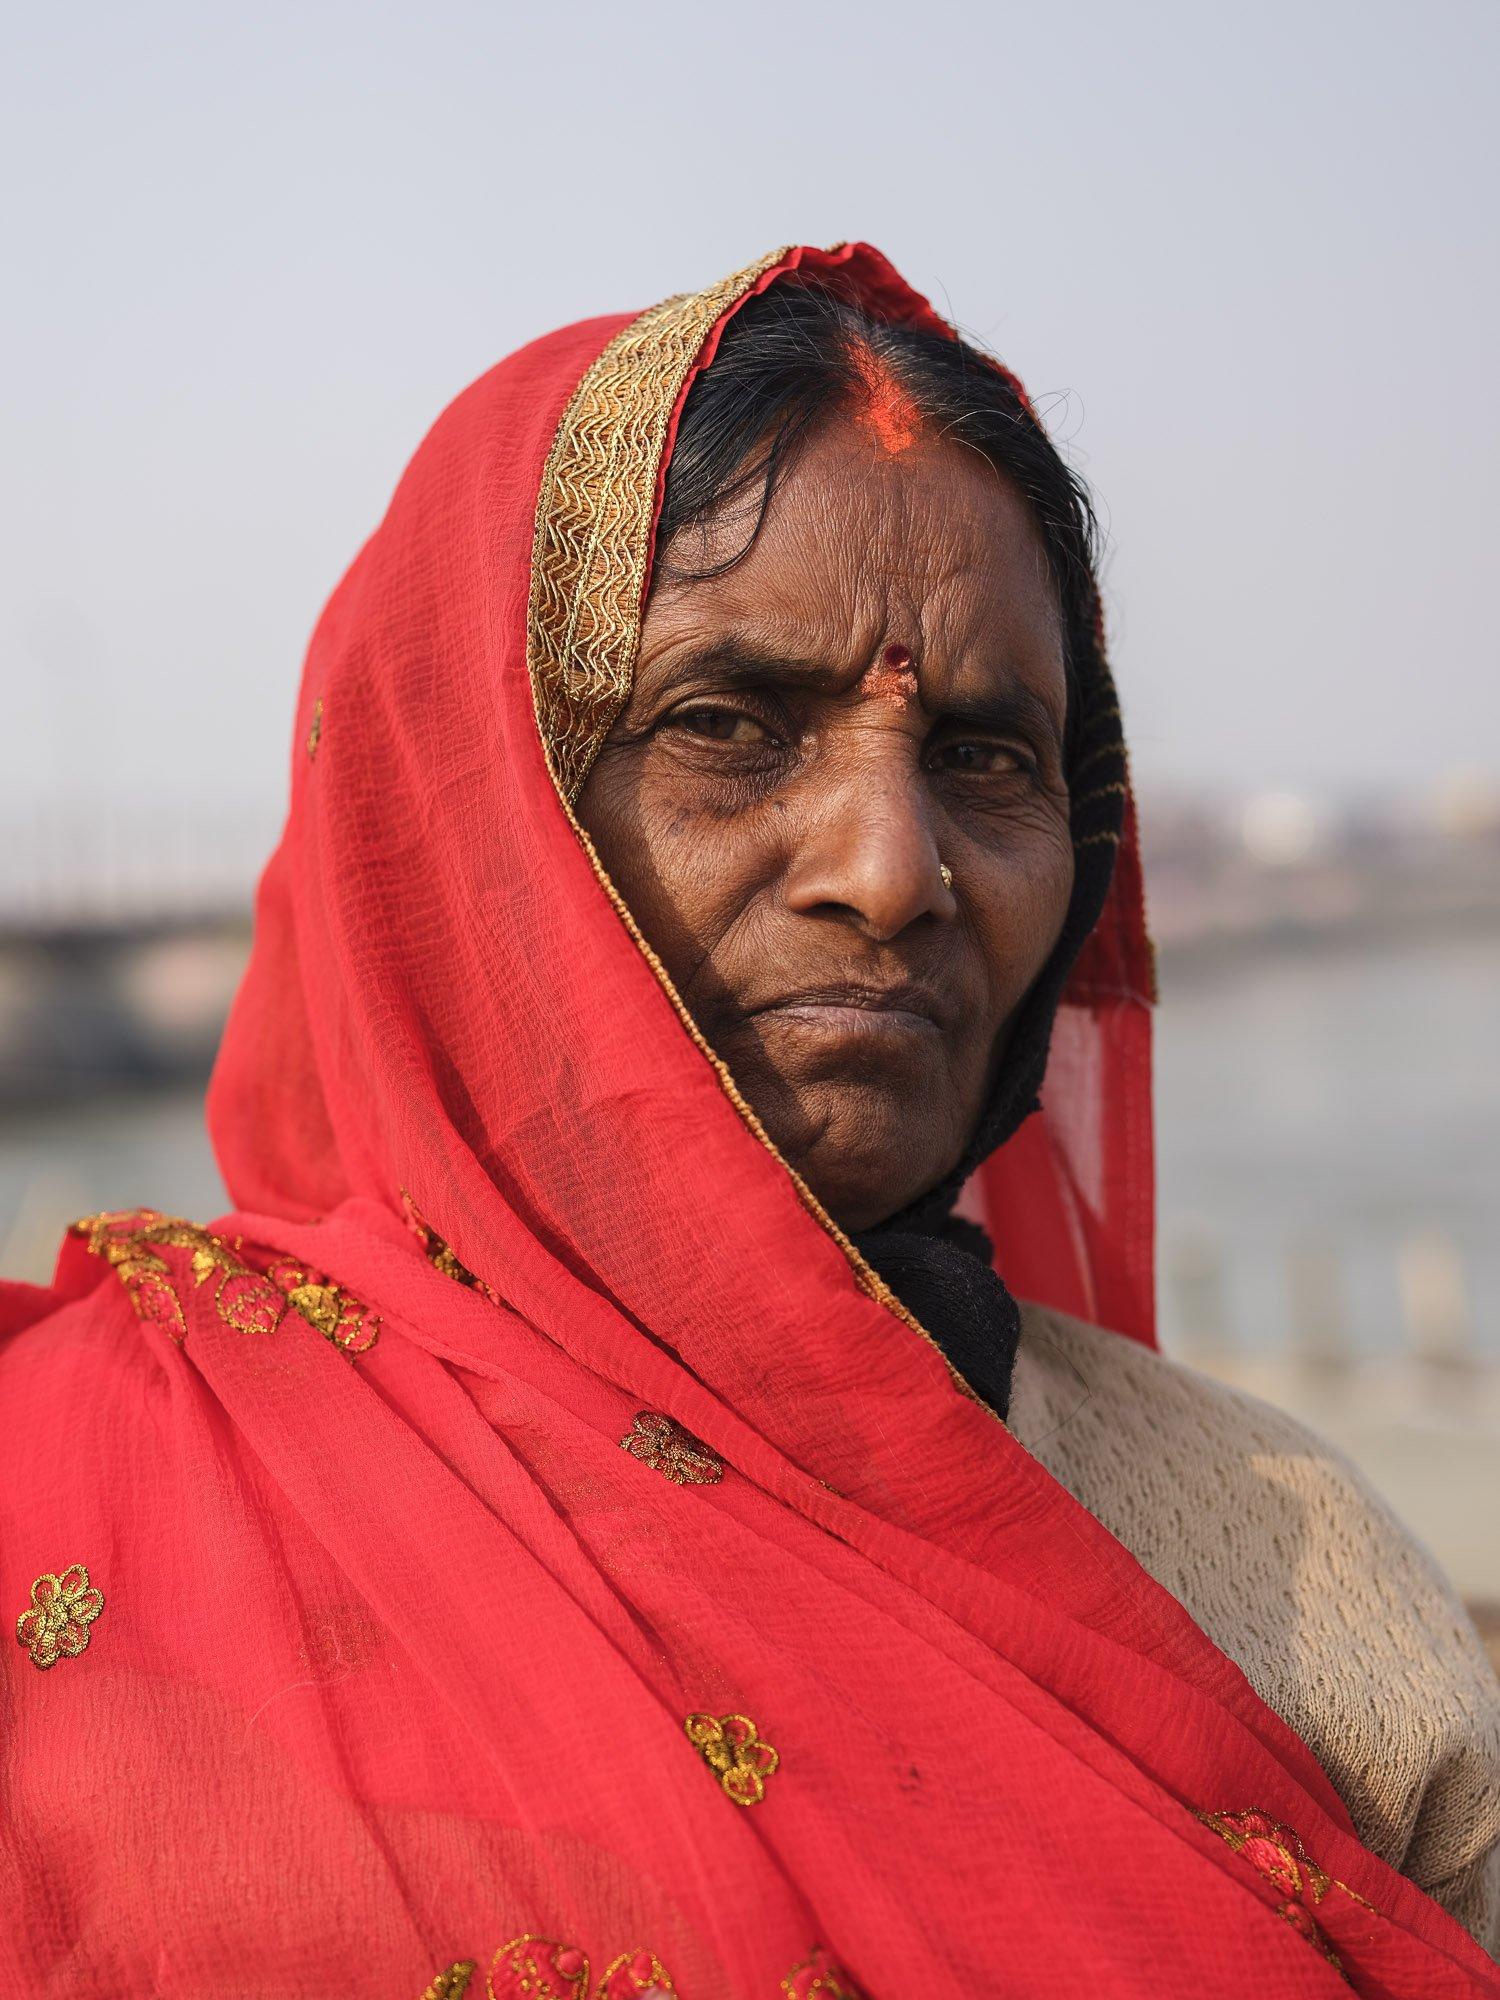 lady red sari pilgrims Kumbh mela 2019 India Allahabad Prayagraj Ardh hindu religious Festival event rivers photographer jose jeuland photography